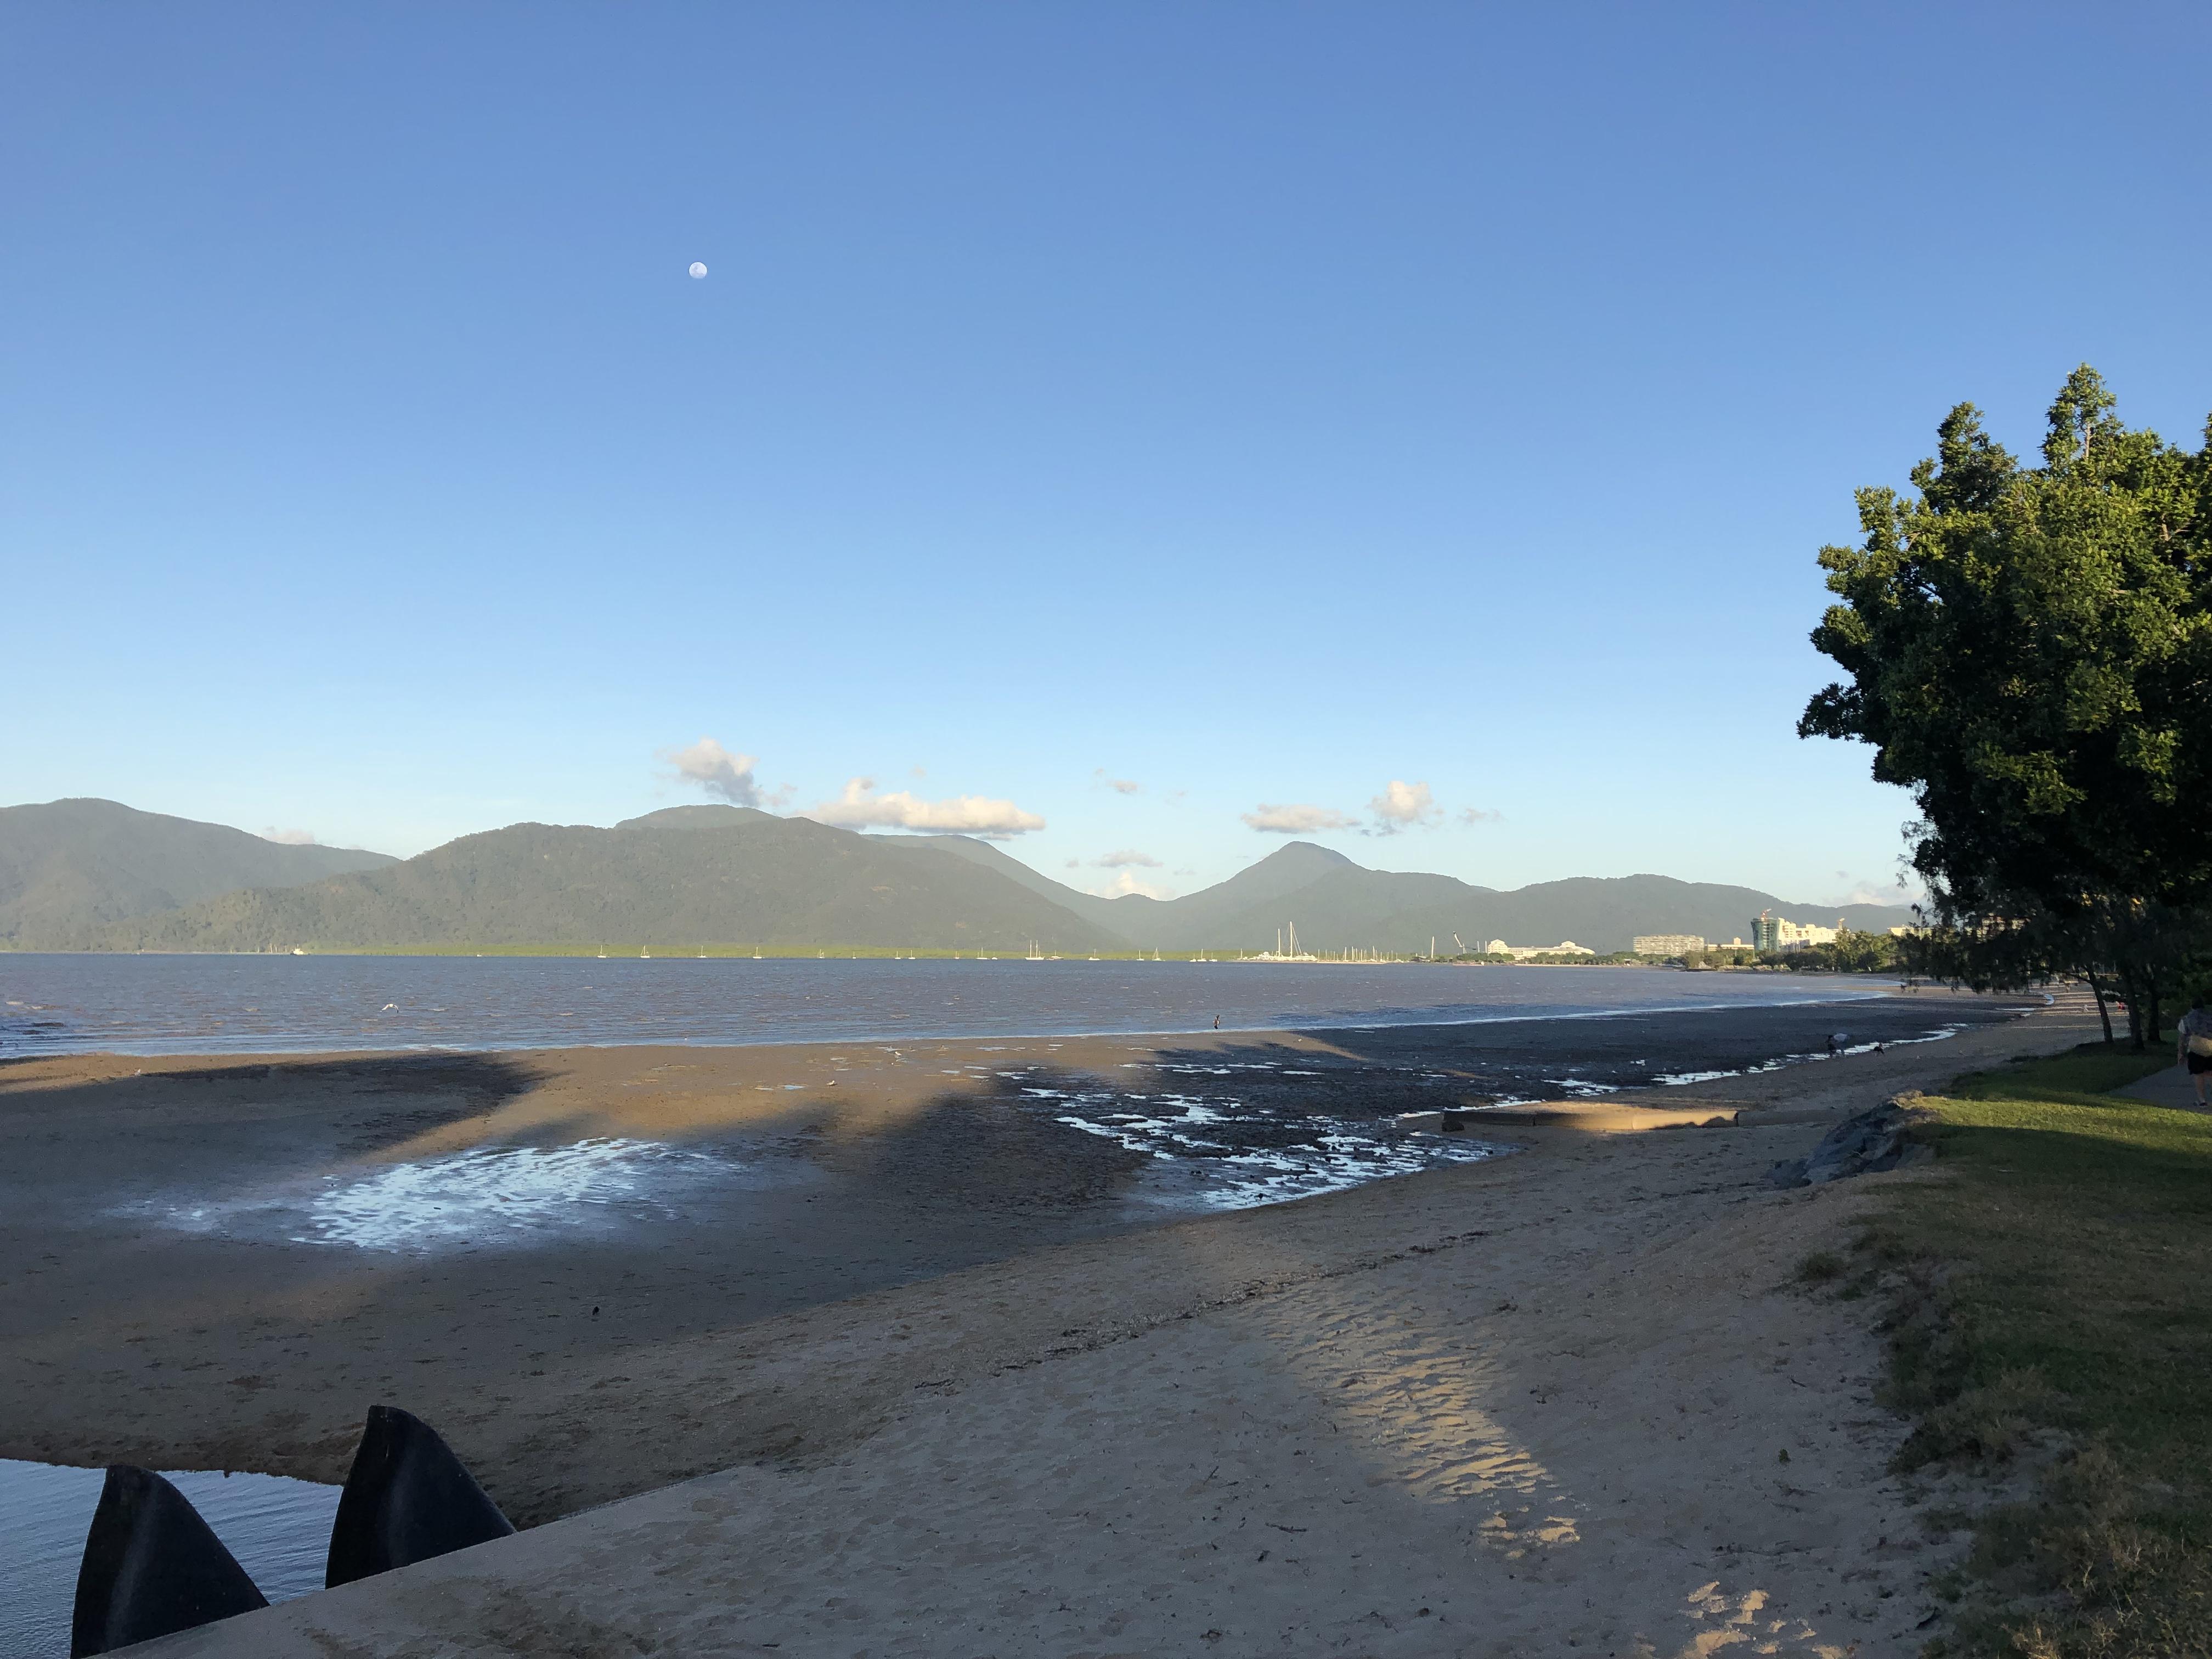 Cairns Beach at the Esplanade